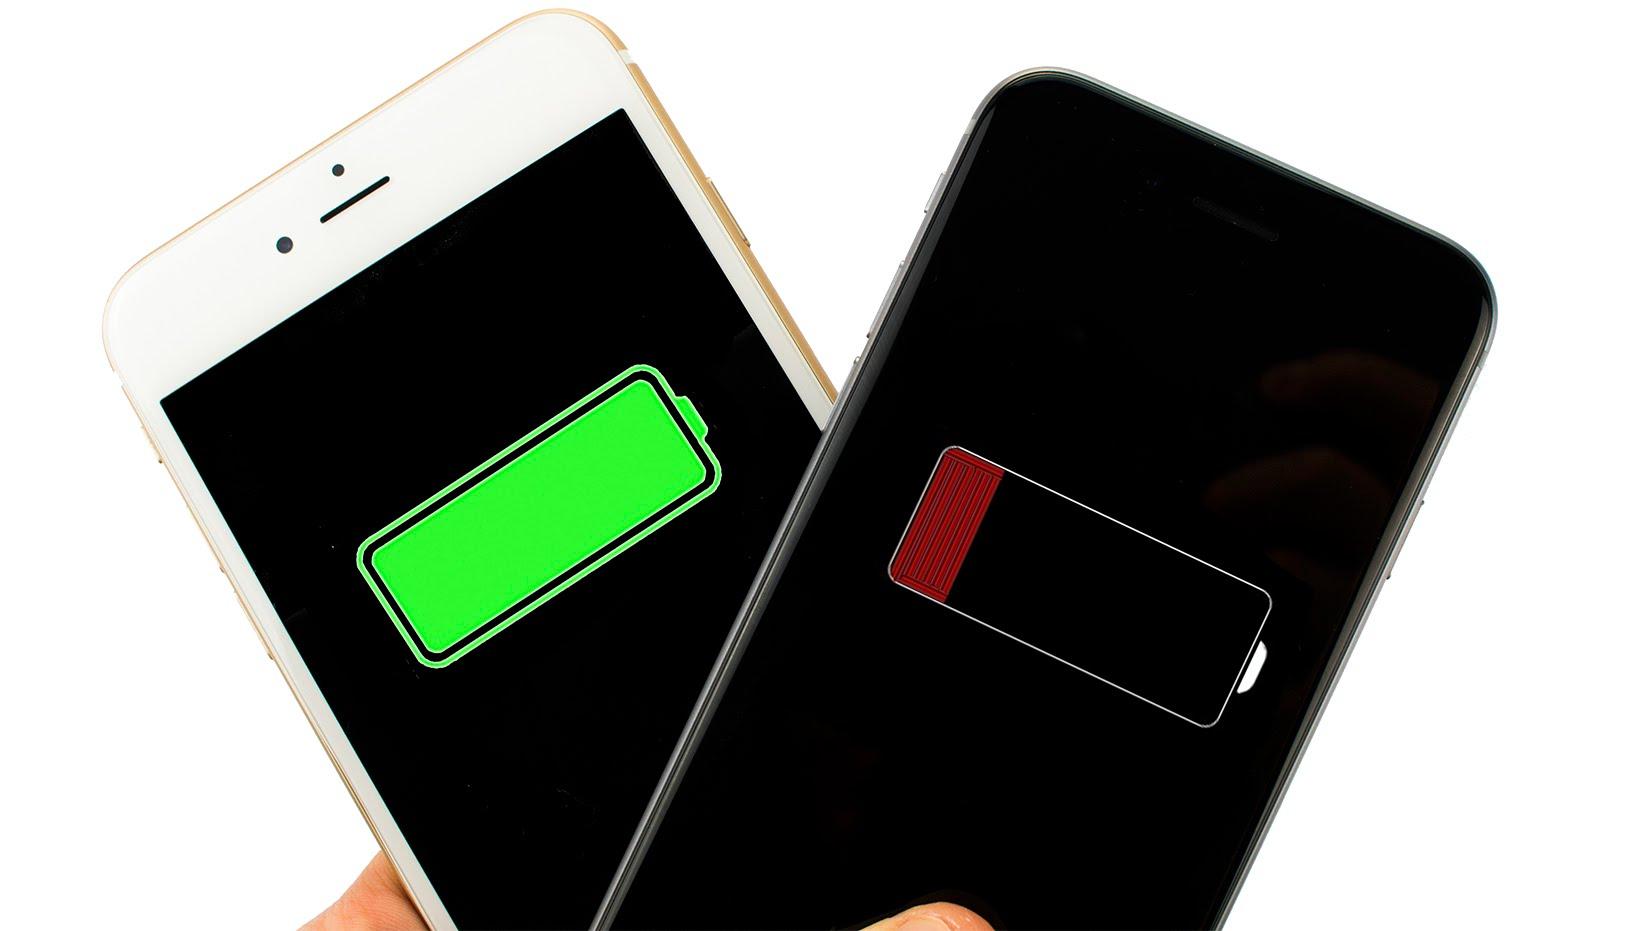 iPhone 6S si spegne improvvisamente